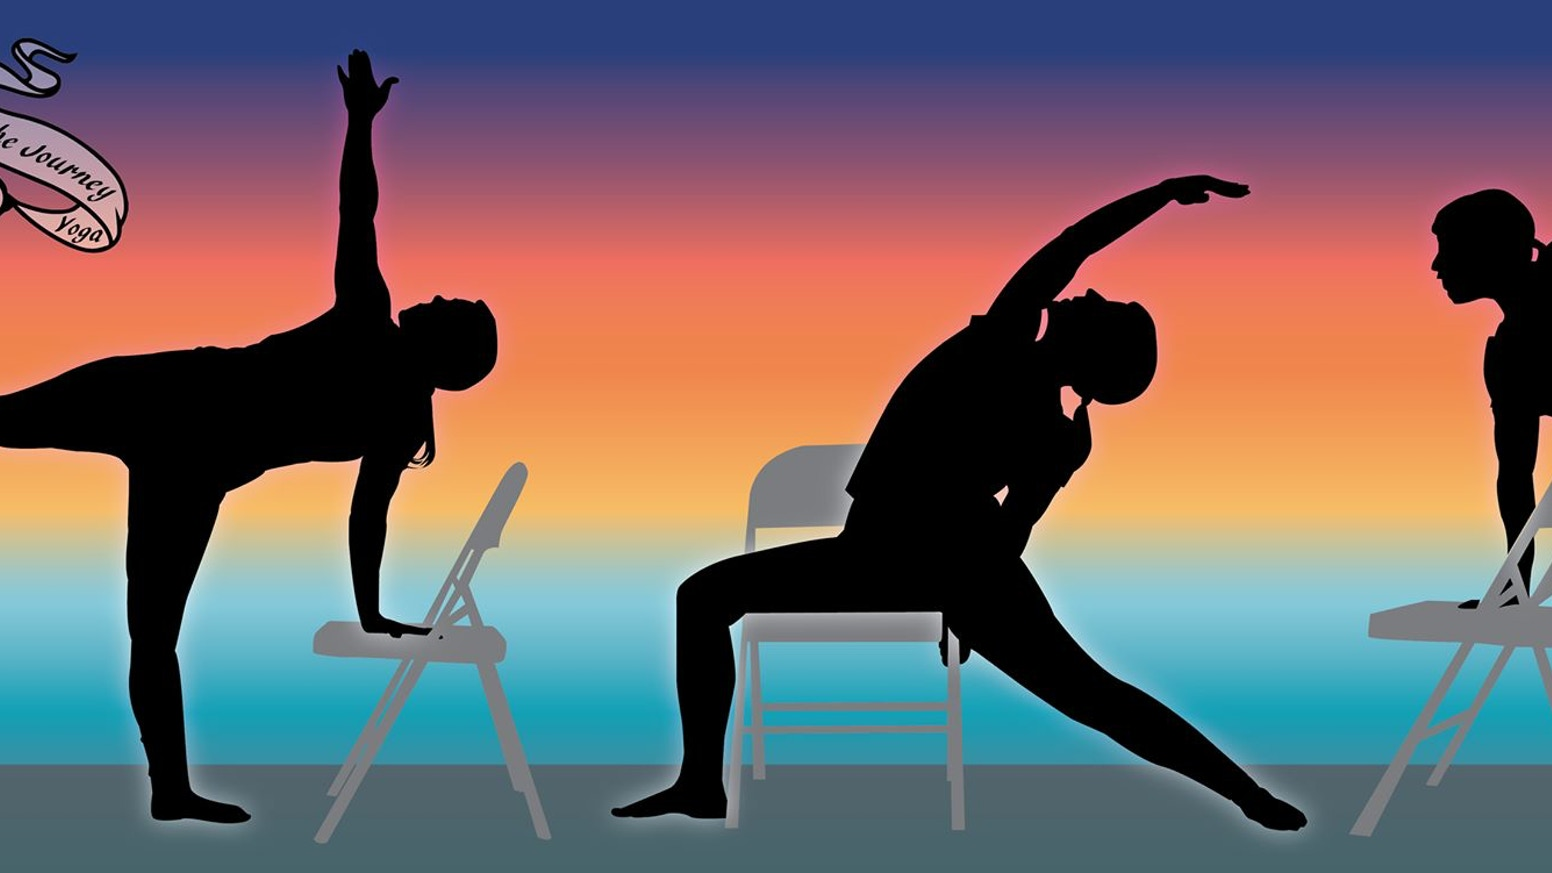 Pull Up A Chair Yoga for Balance & Flexibility DVD by Jeannine — Kickstarter